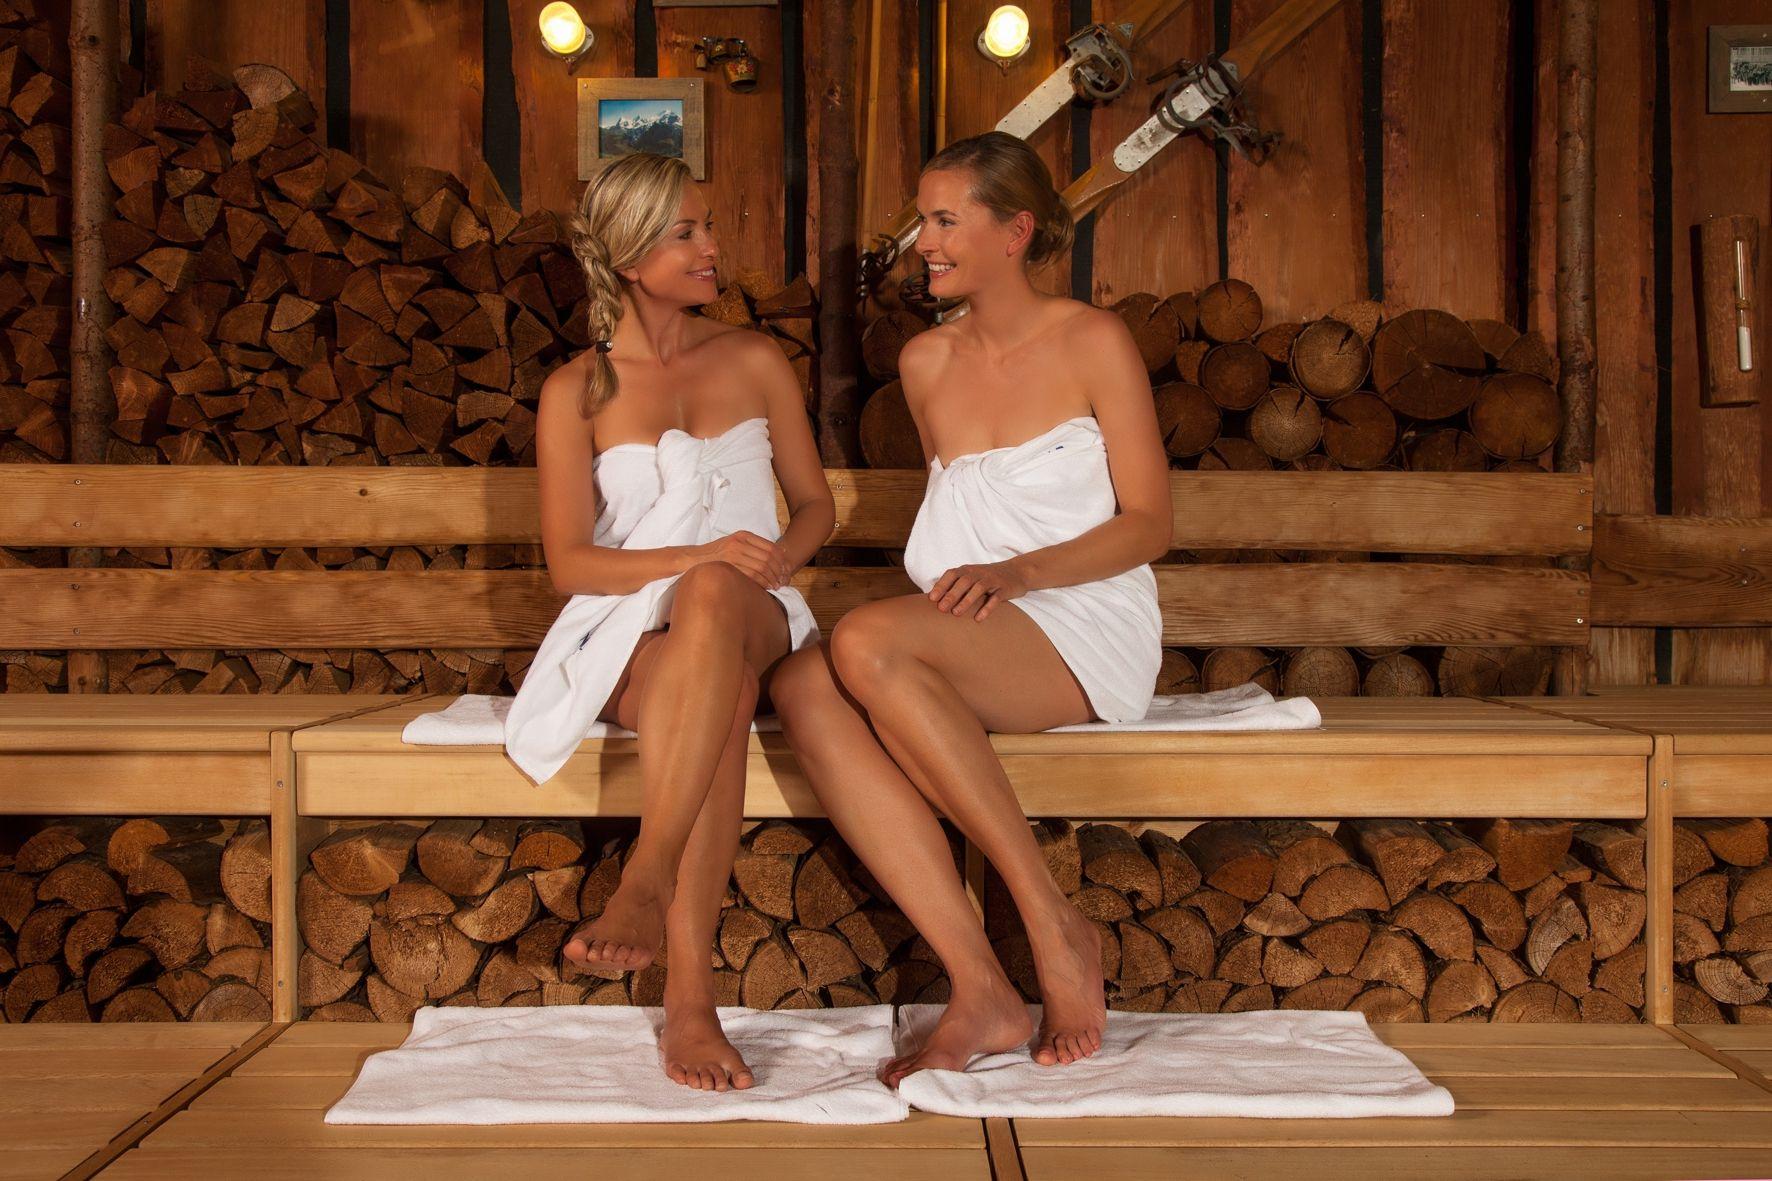 traditional bavarian atmosphere is not only attractive for real bavarian men our alpenstadl. Black Bedroom Furniture Sets. Home Design Ideas